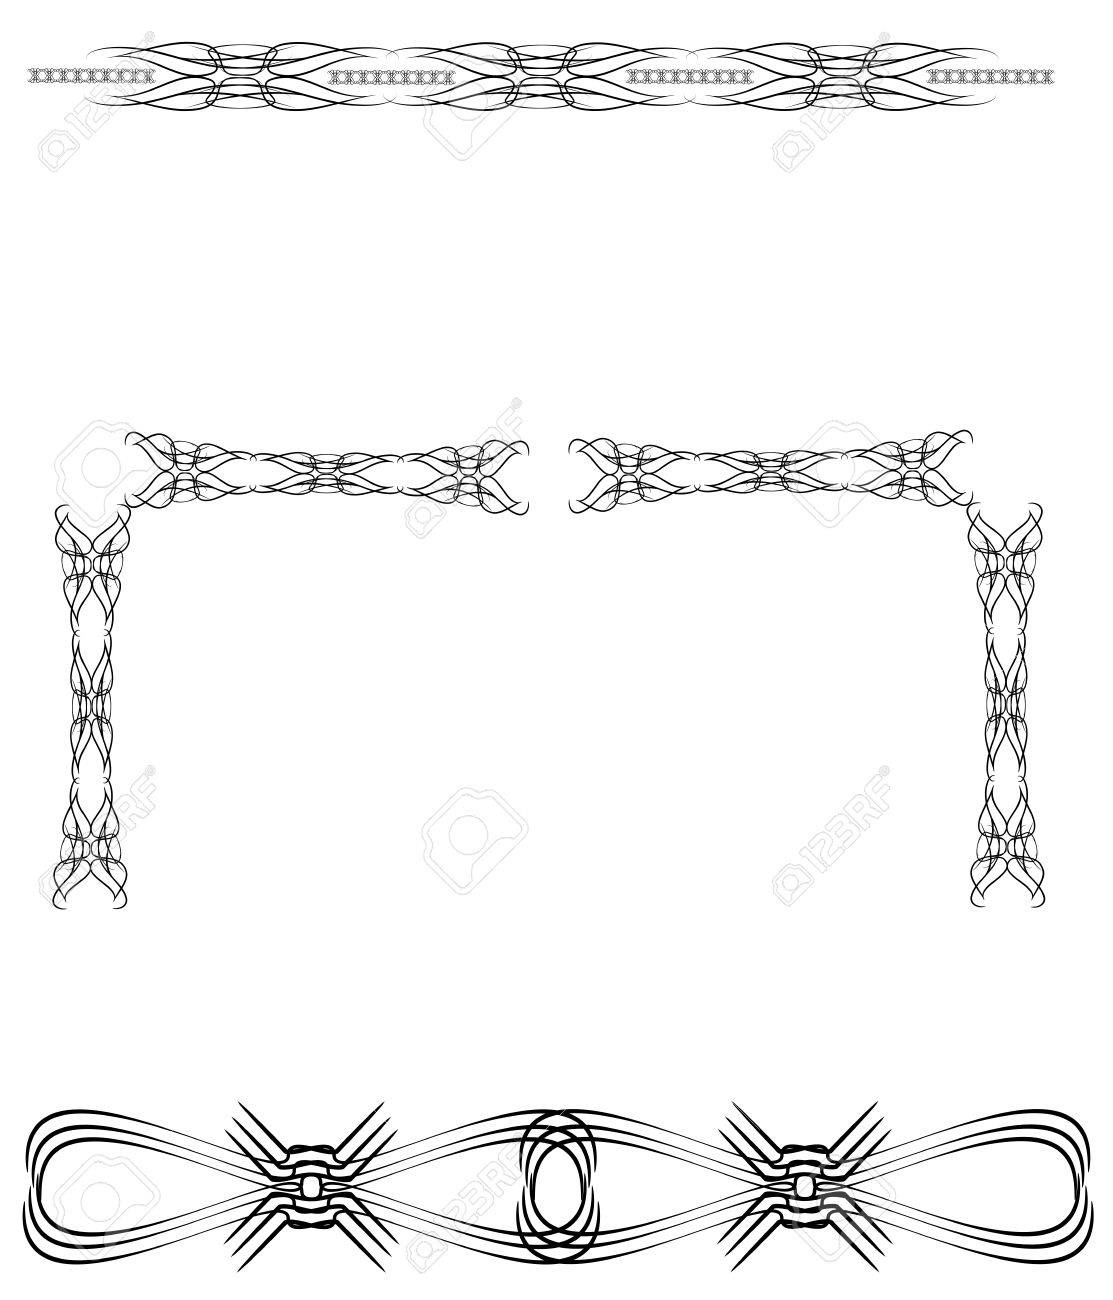 Diseño Tribal Del Tatuaje De La Espalda Baja Ilustraciones